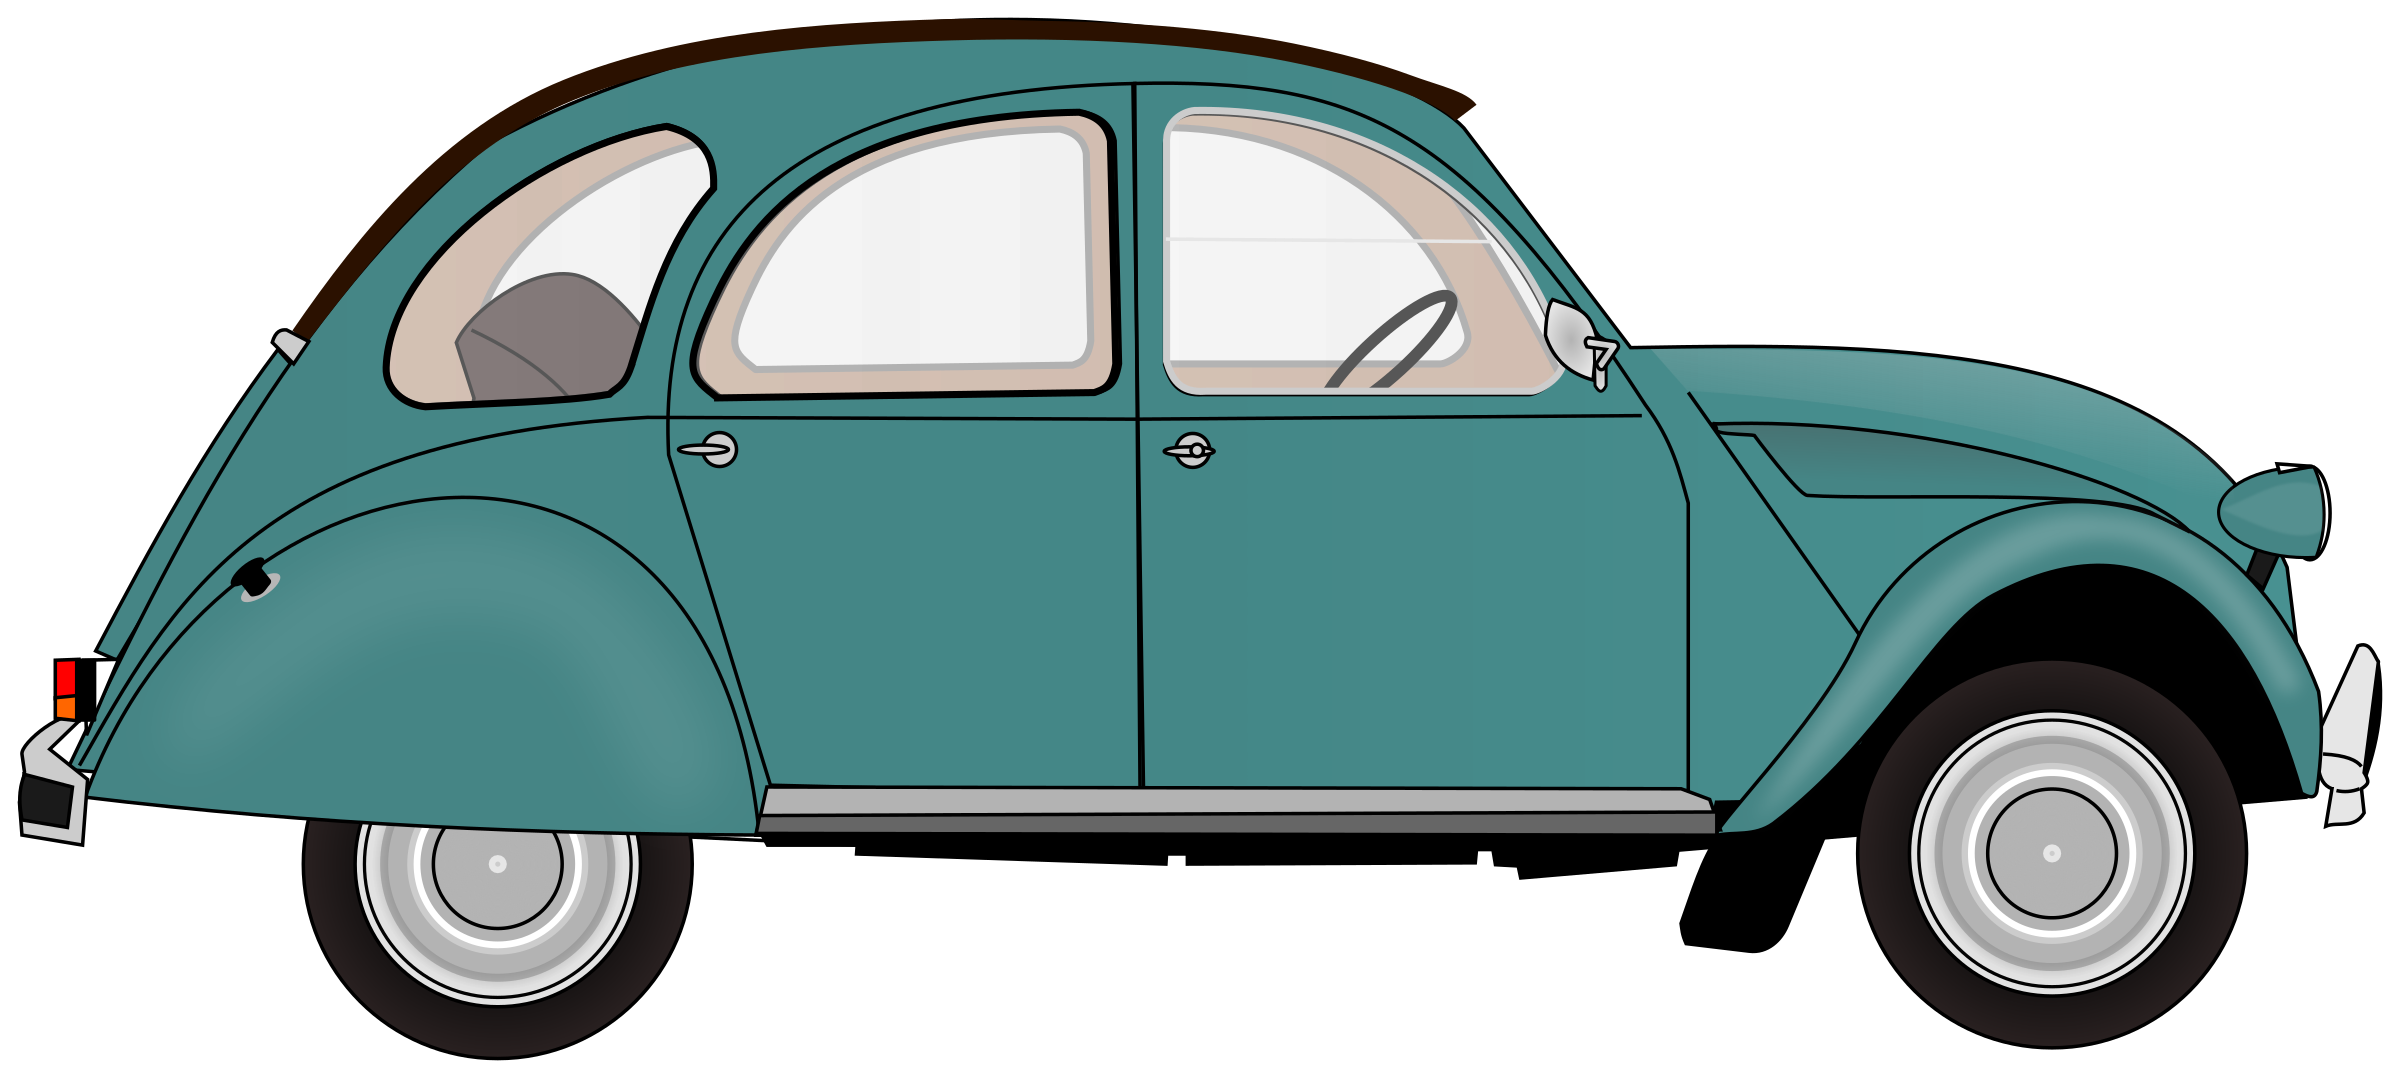 Bug car clipart banner library stock Clipart - 2CV banner library stock